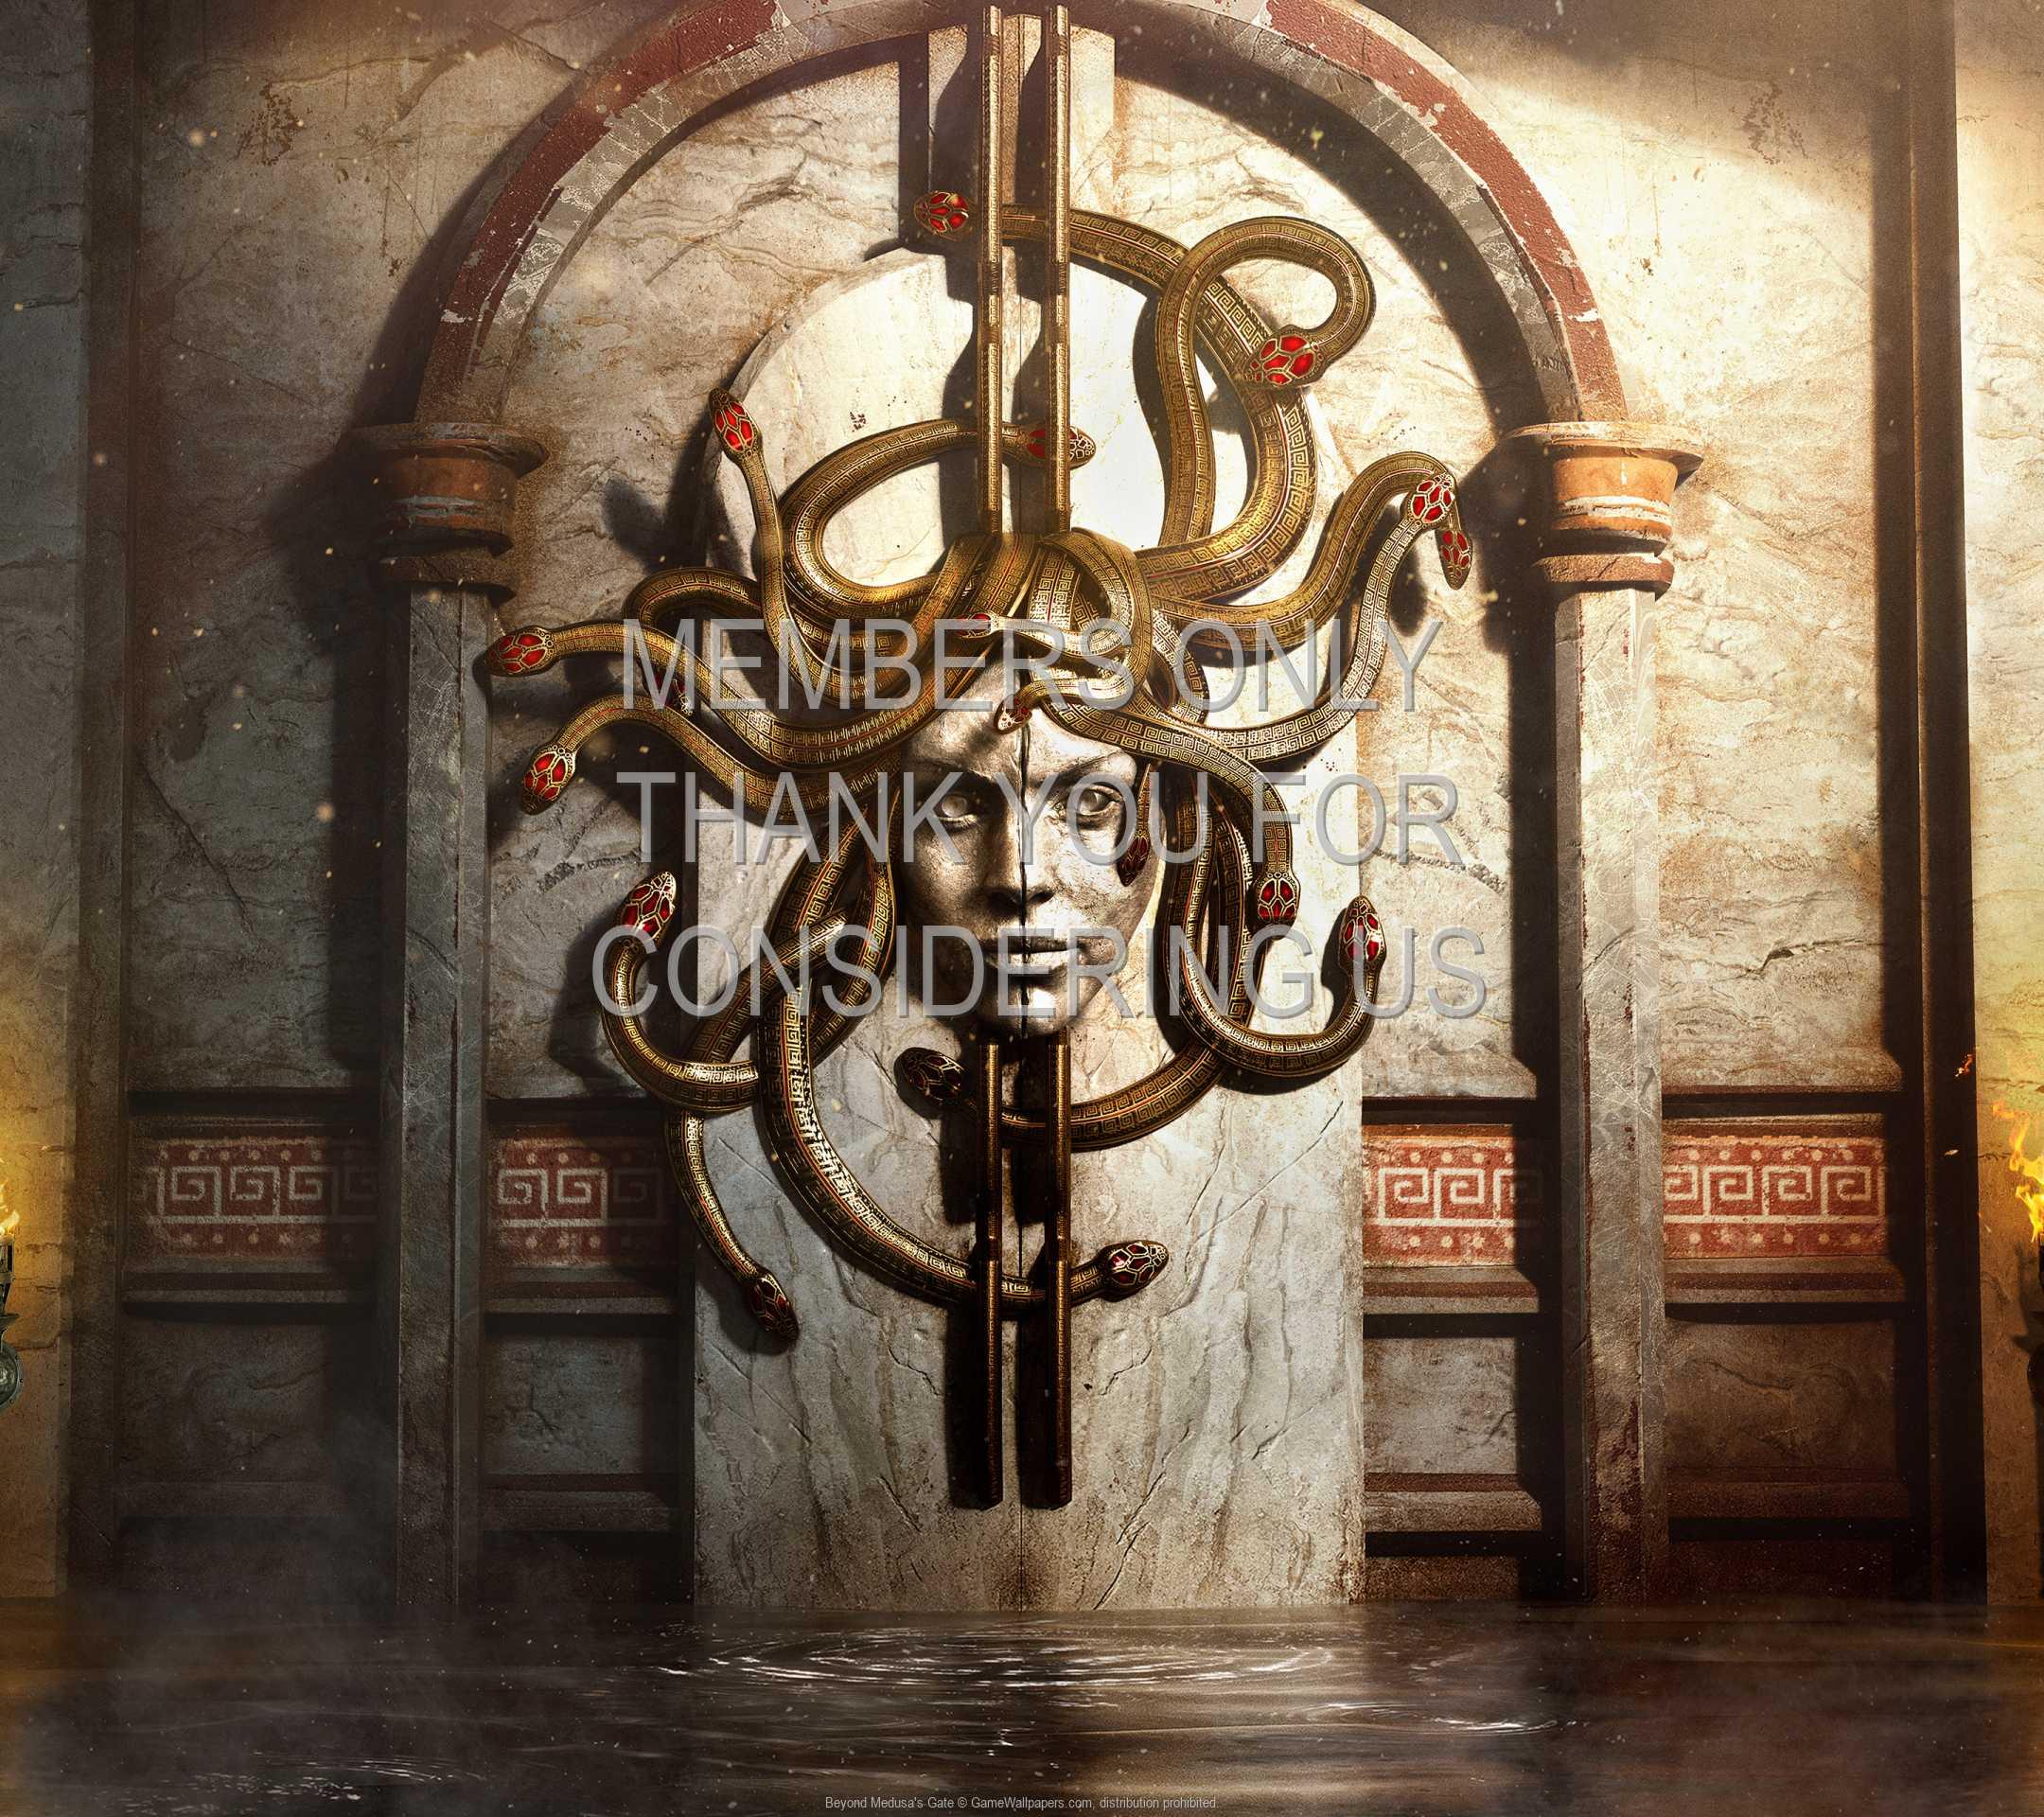 Beyond Medusa's Gate 1080p Horizontal Mobiele achtergrond 01